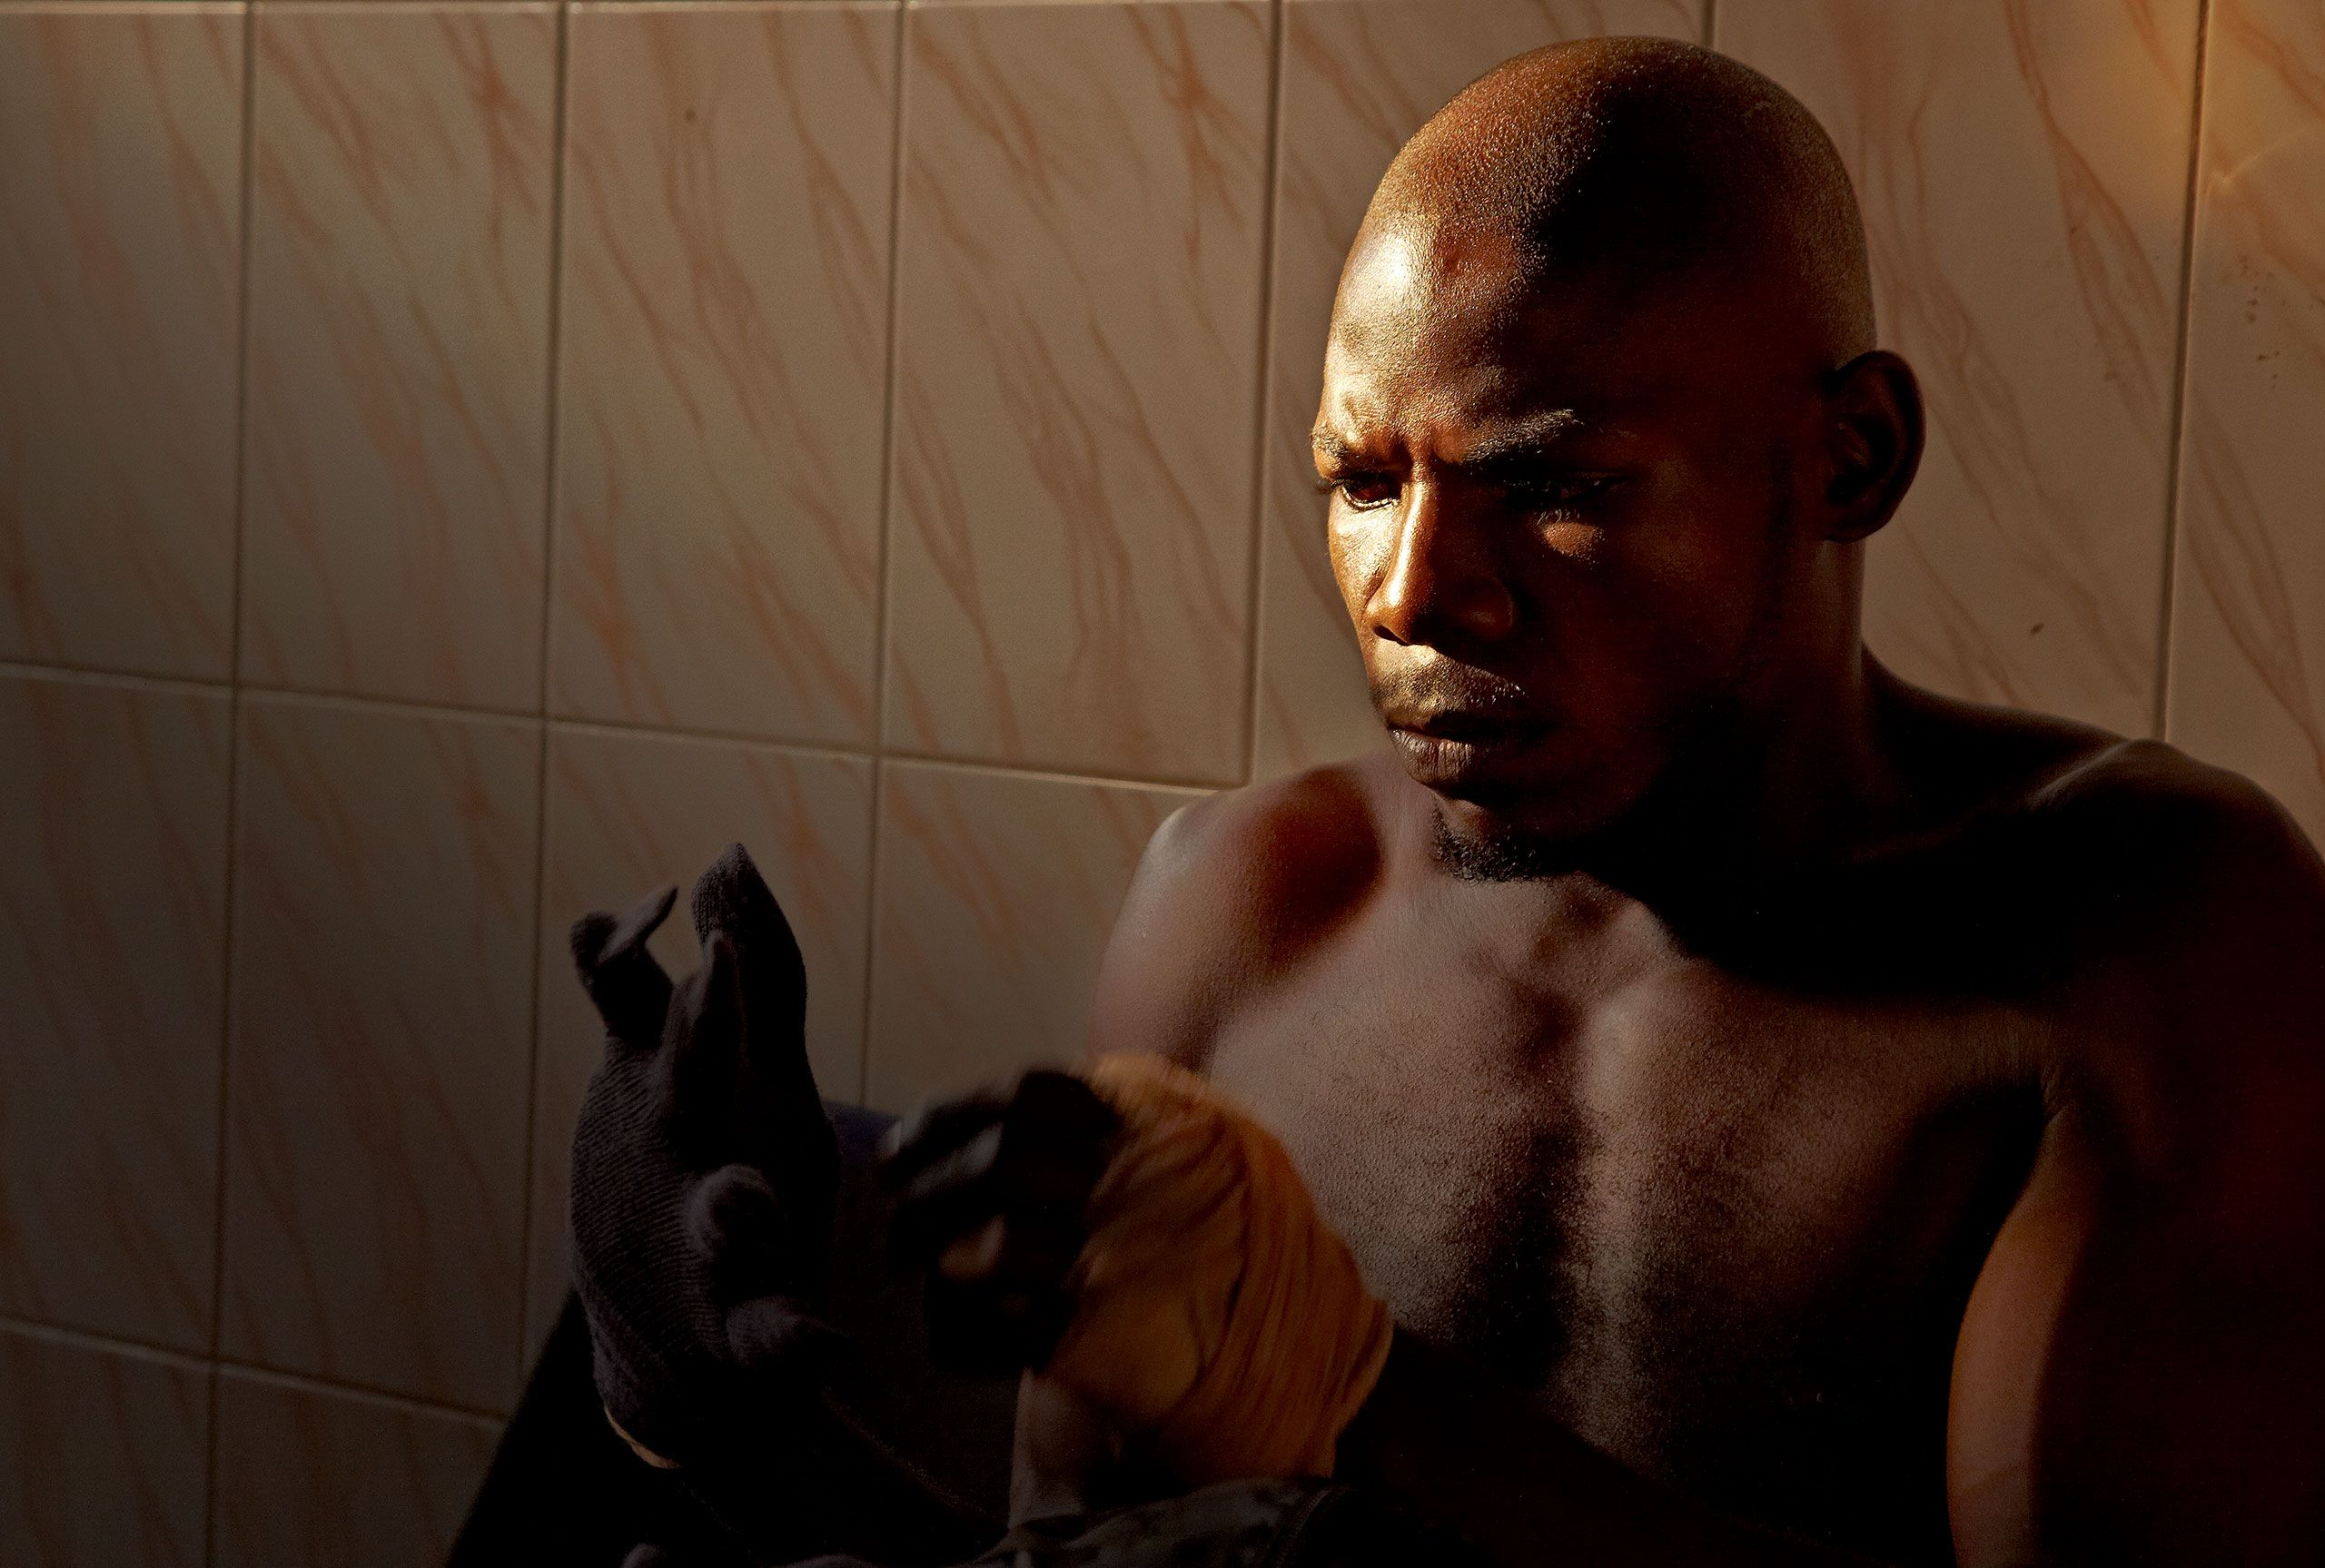 Kampala_Boxing_2011-1576.jpg